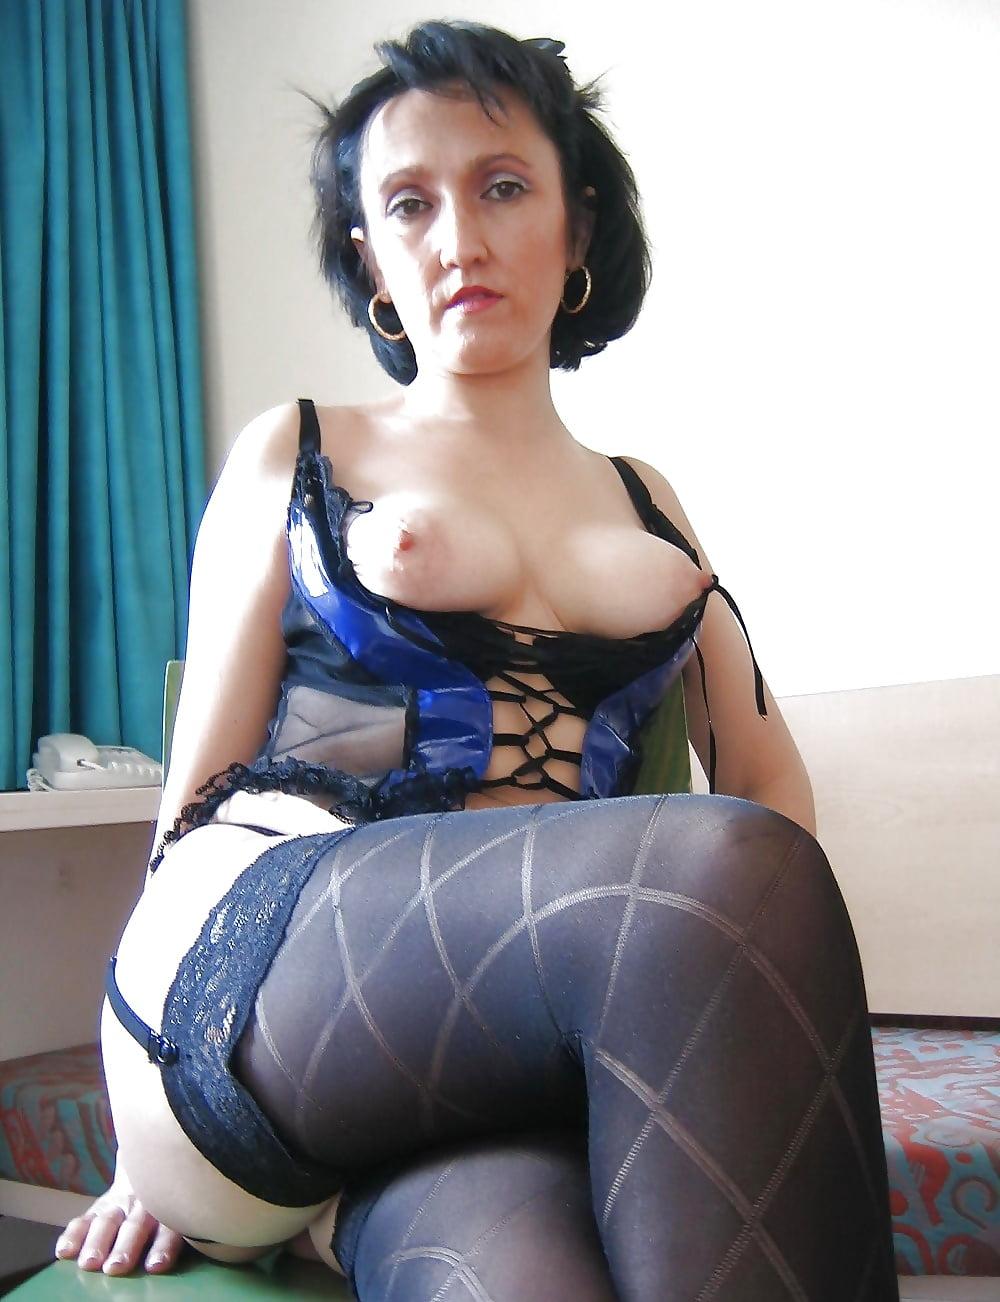 Pussy mature stockings Stockings